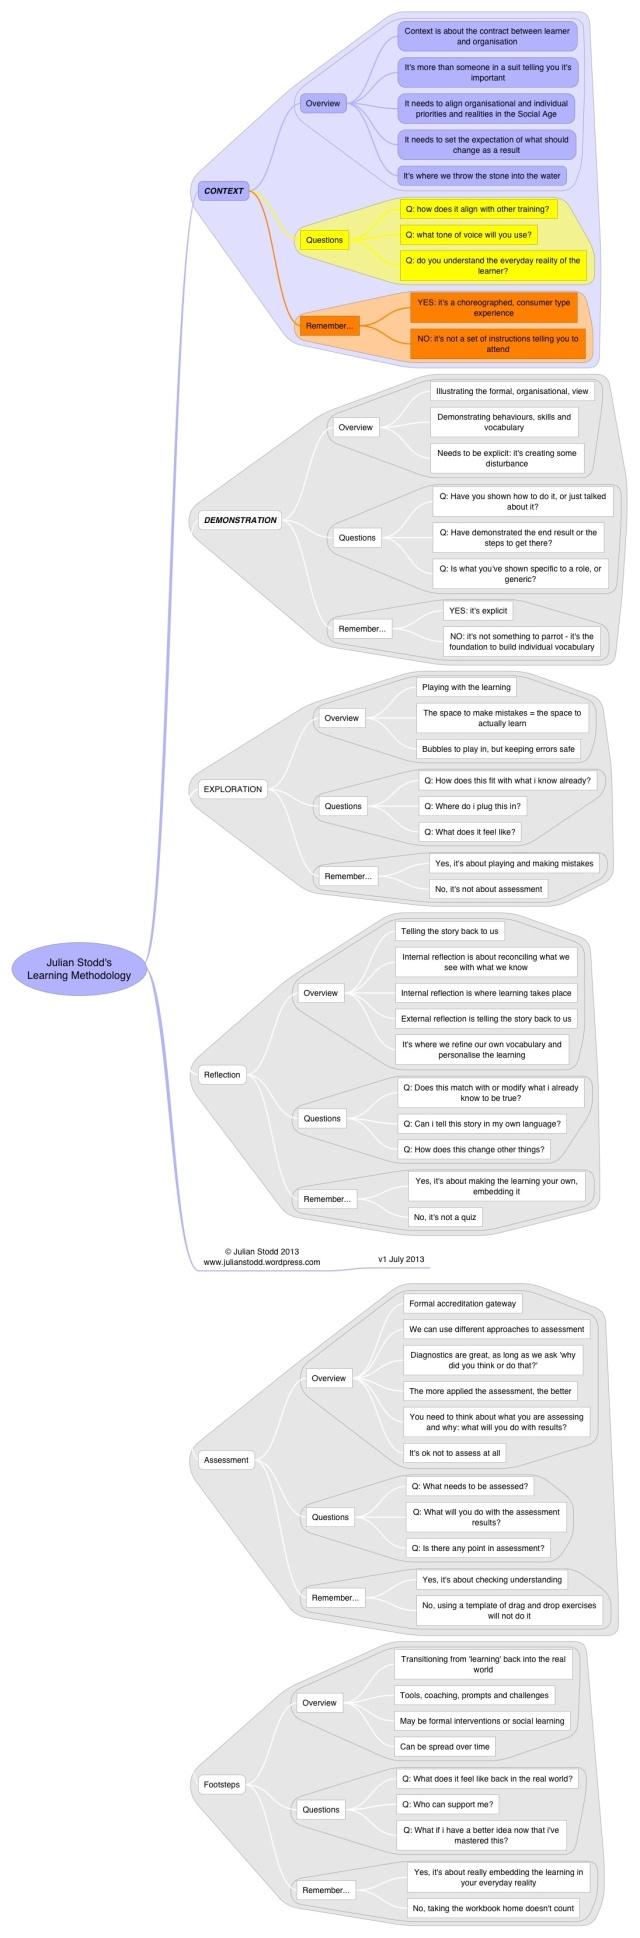 Methodology: Context